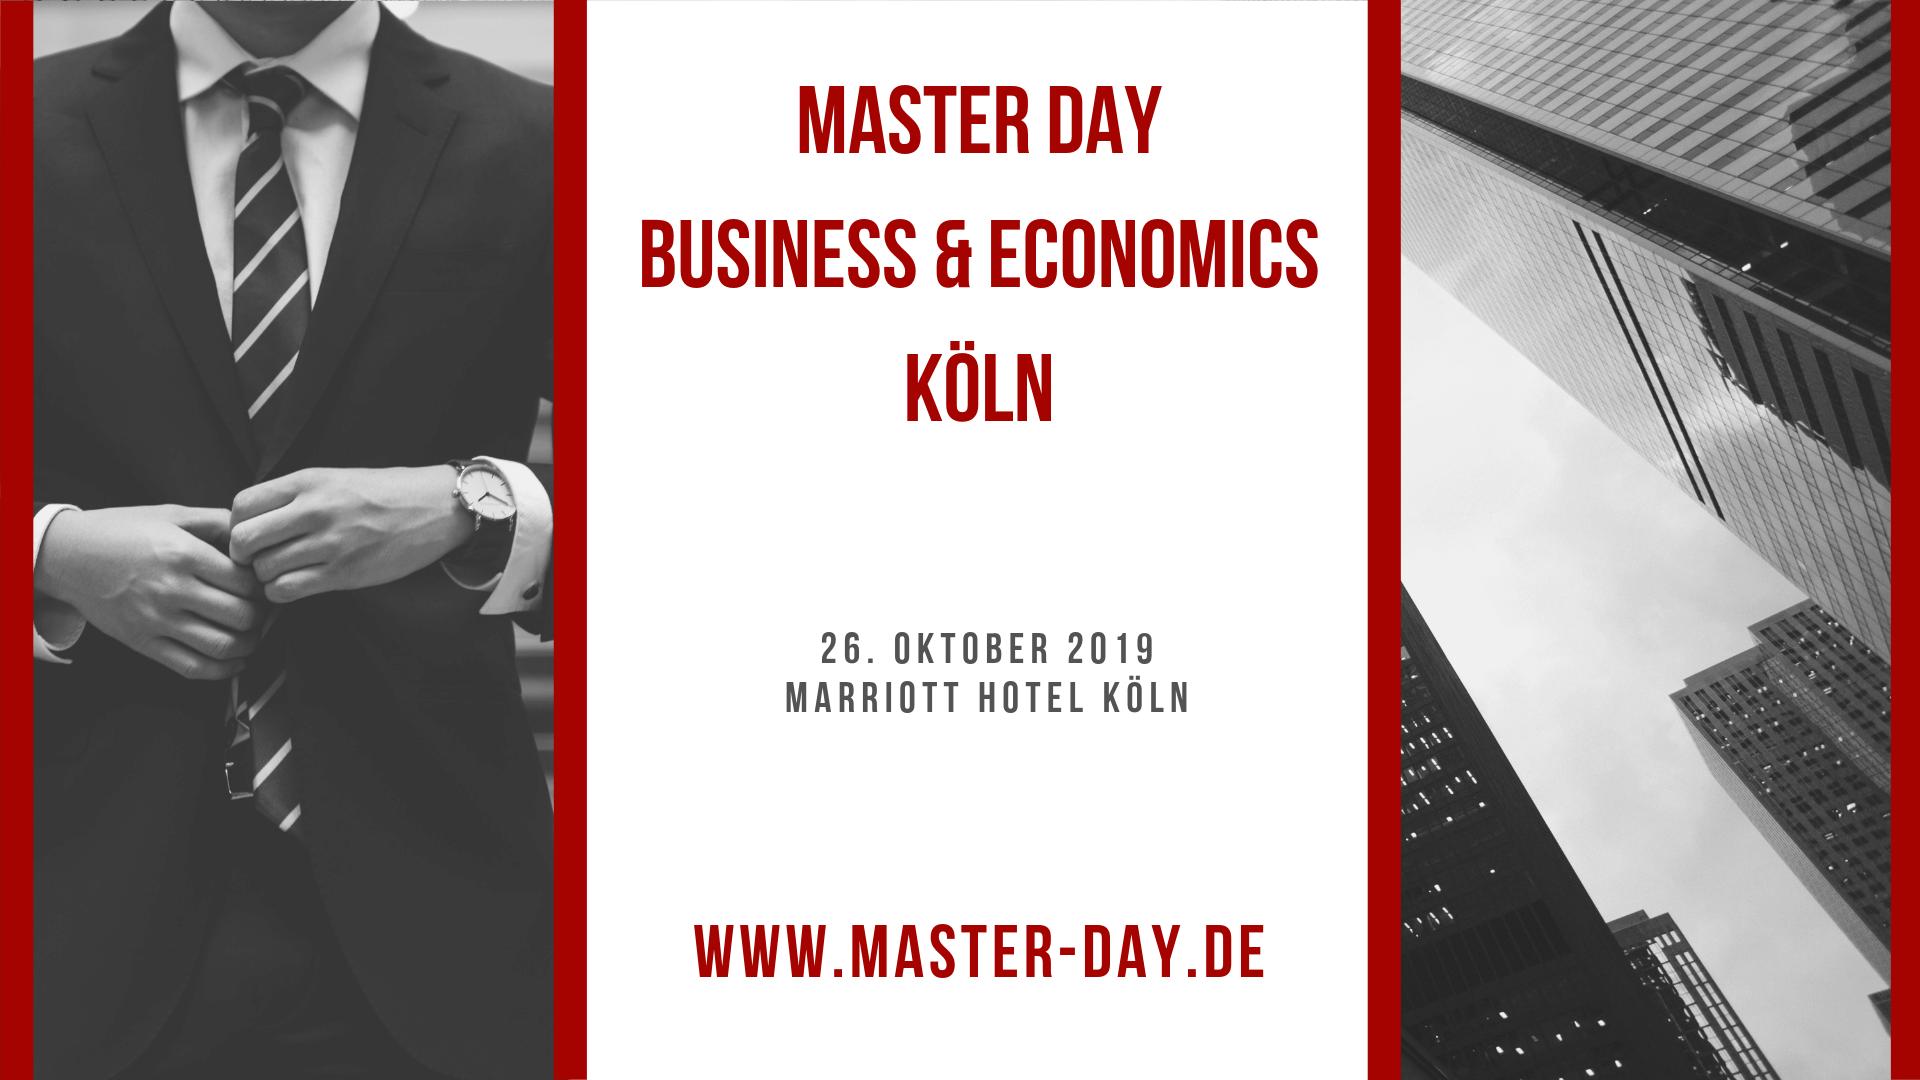 Master Day Business & Economics Köln